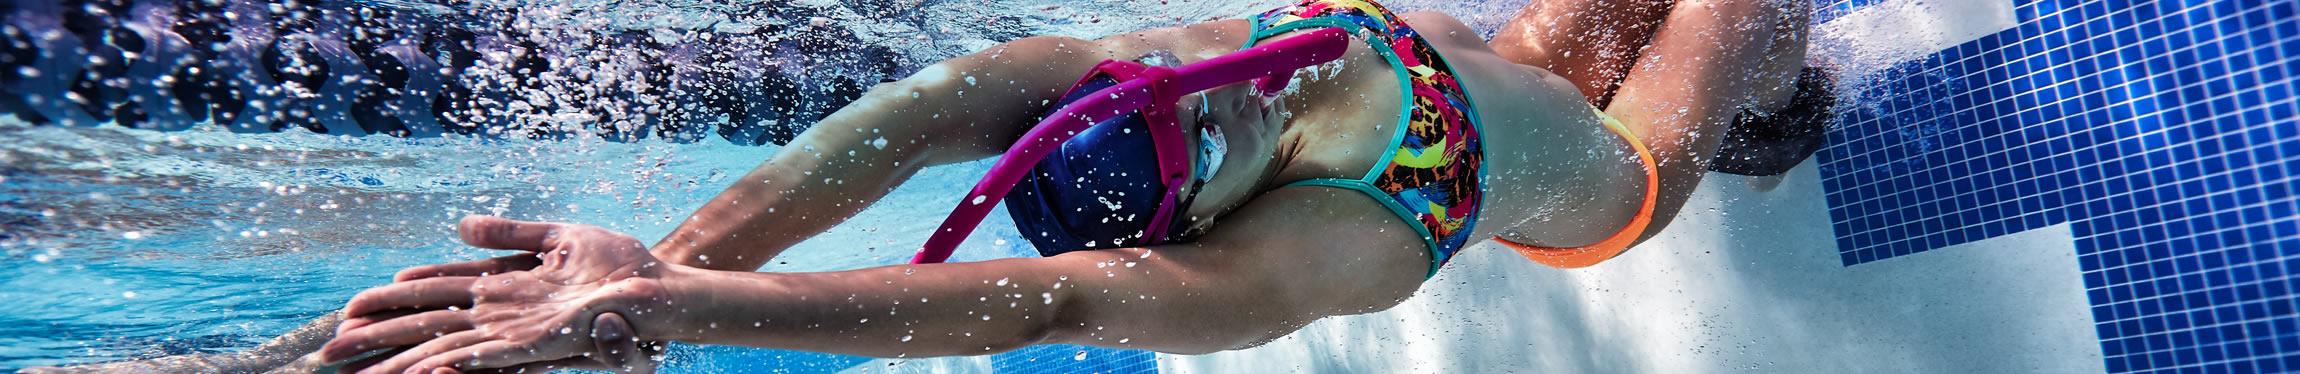 42ff0e5454 SwimOutlet.com - The Web's Most Popular Swim Shop! Women's Swimwear, Men's  Swimwear, Swim Gear & More!